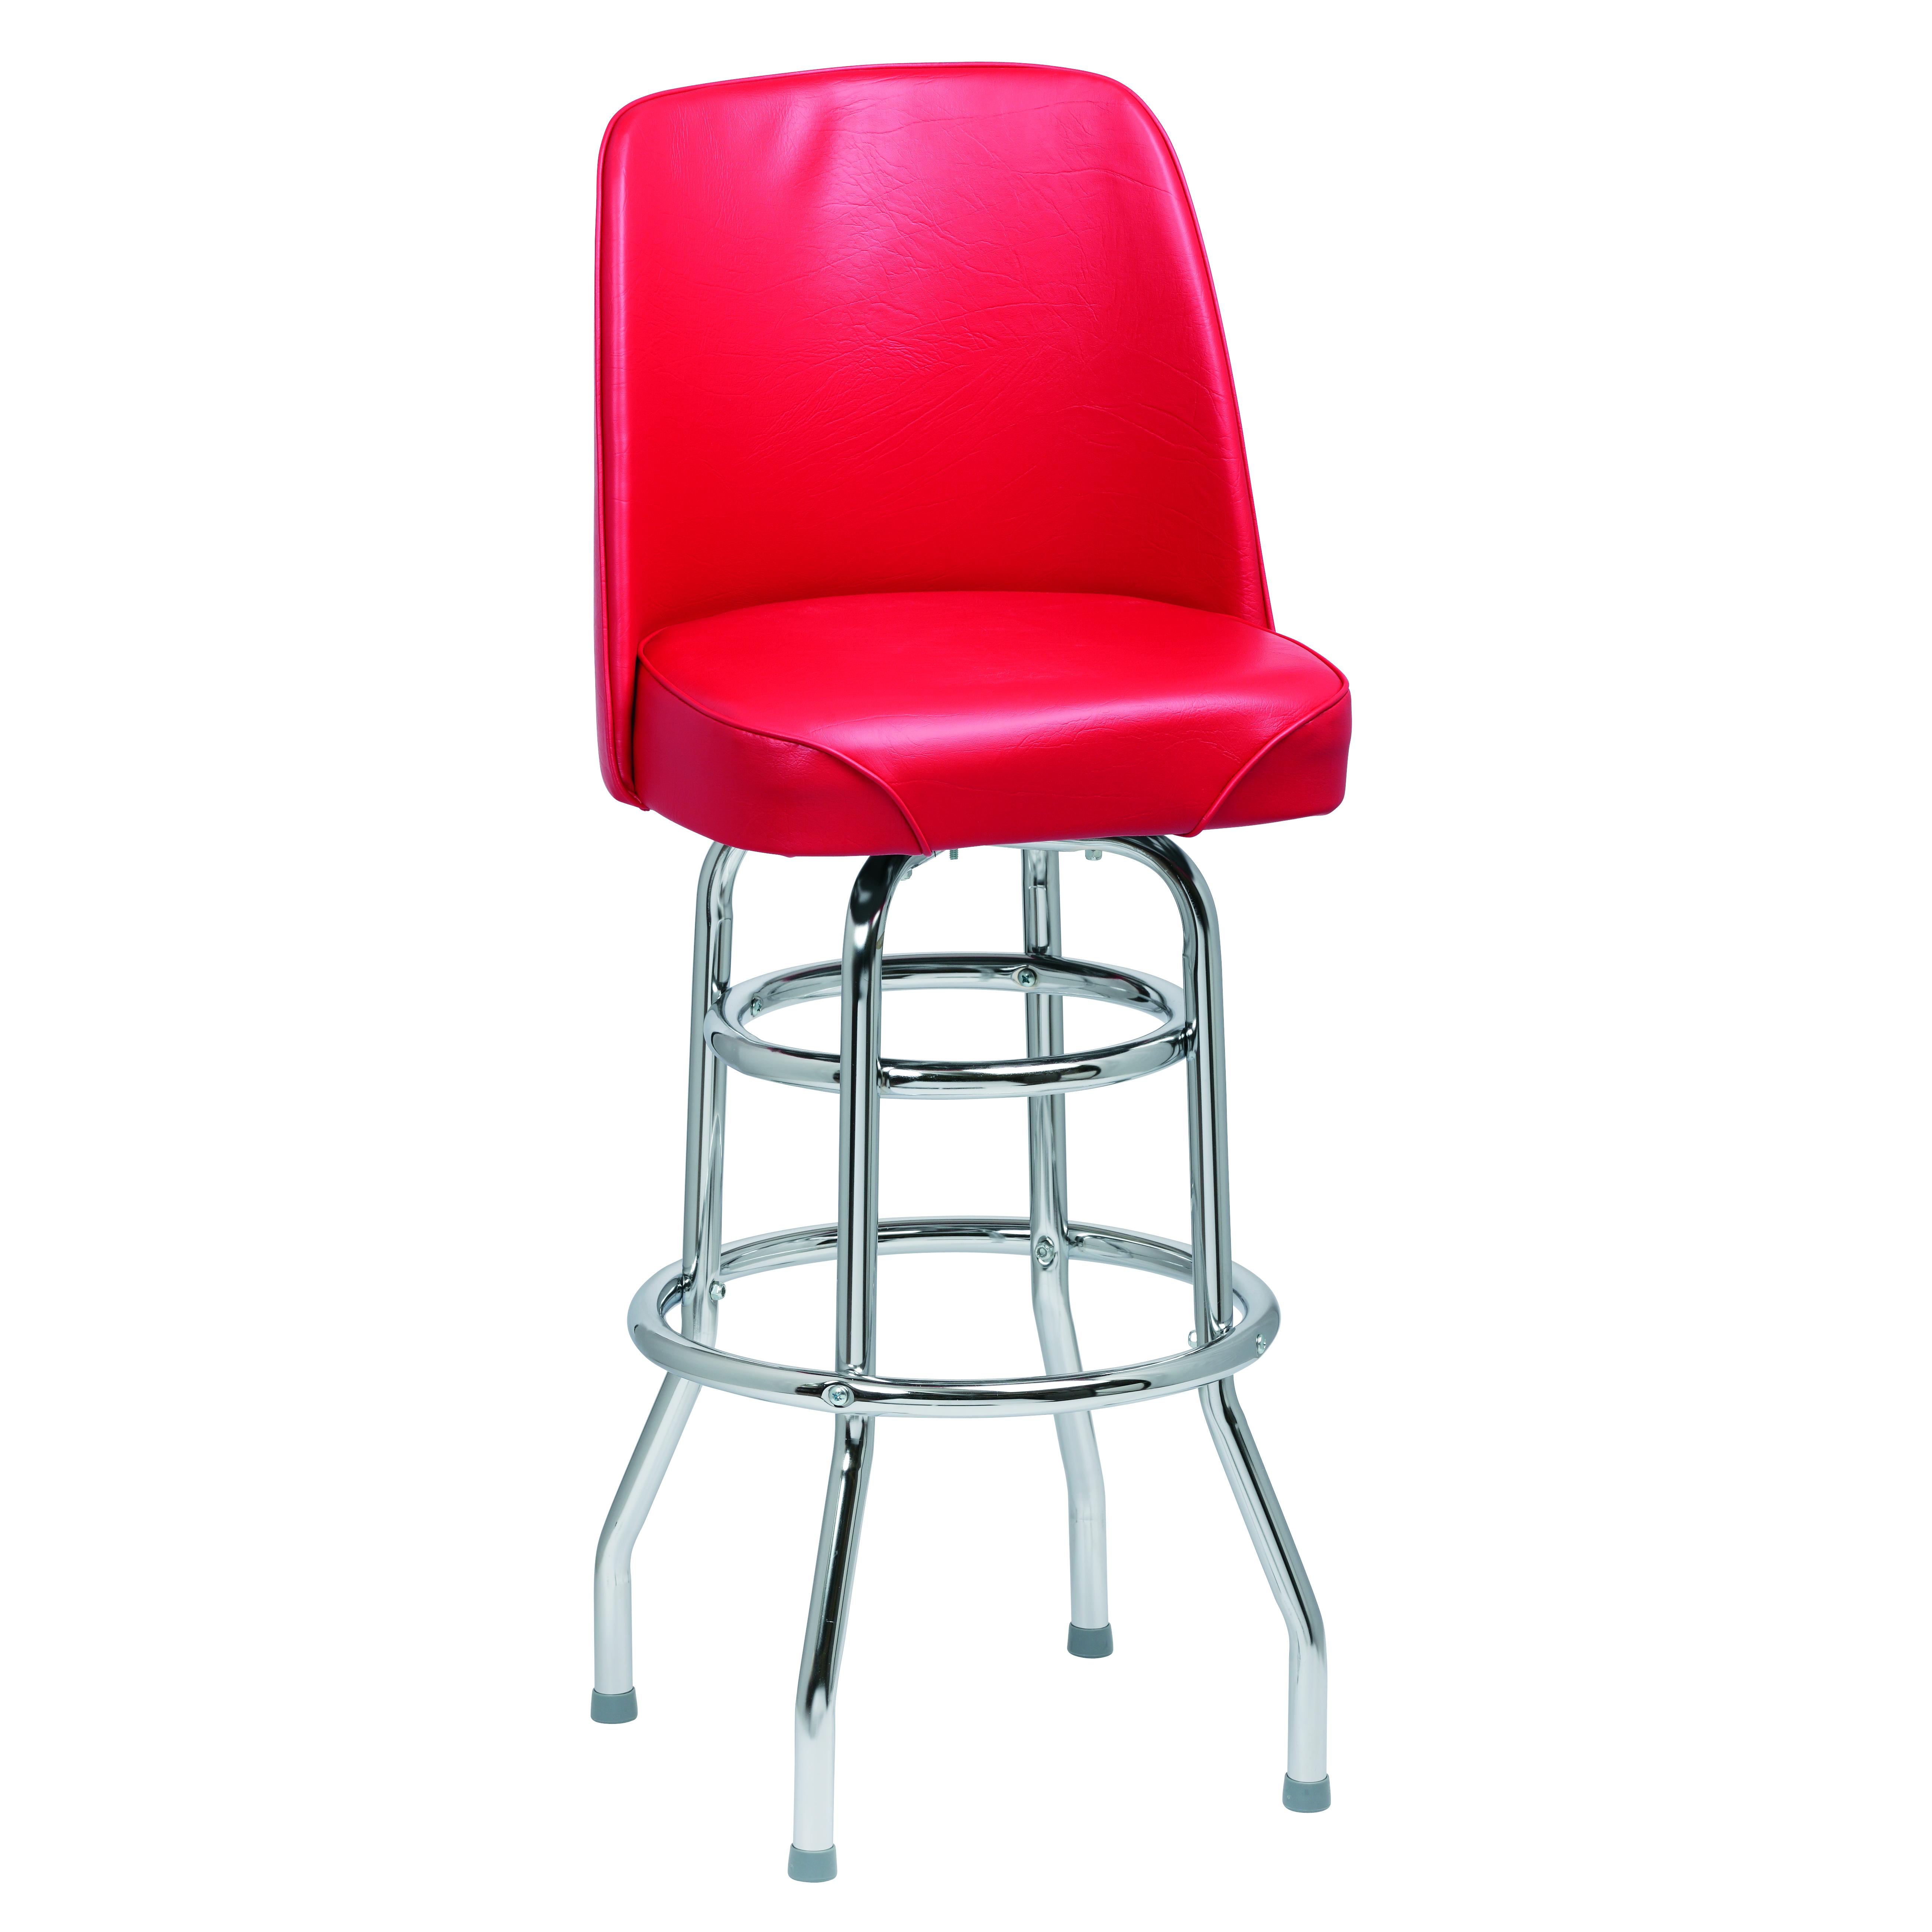 Royal Industries ROY 7722 R bar stool, swivel, indoor